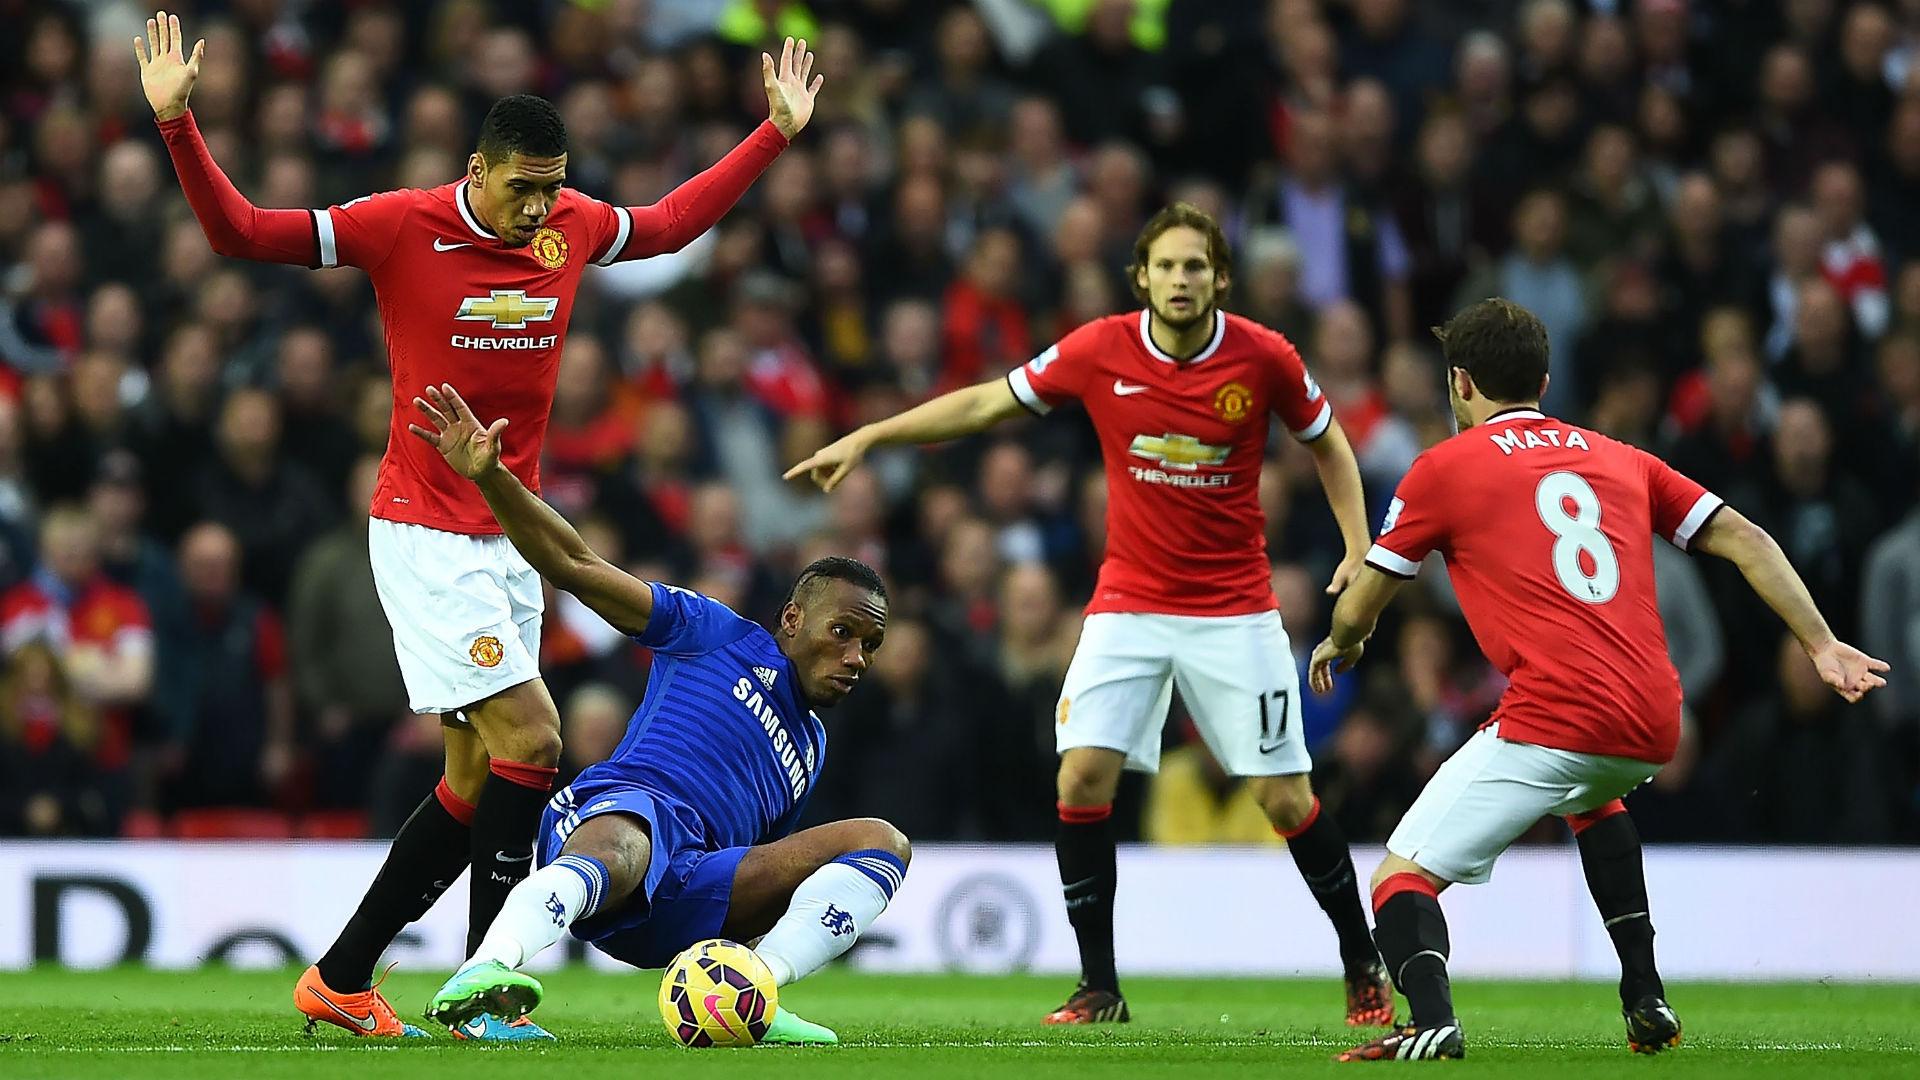 Laga MU vs Chelsea, Adu Kemampuan Terbaik atau Adu Performa Buruk?